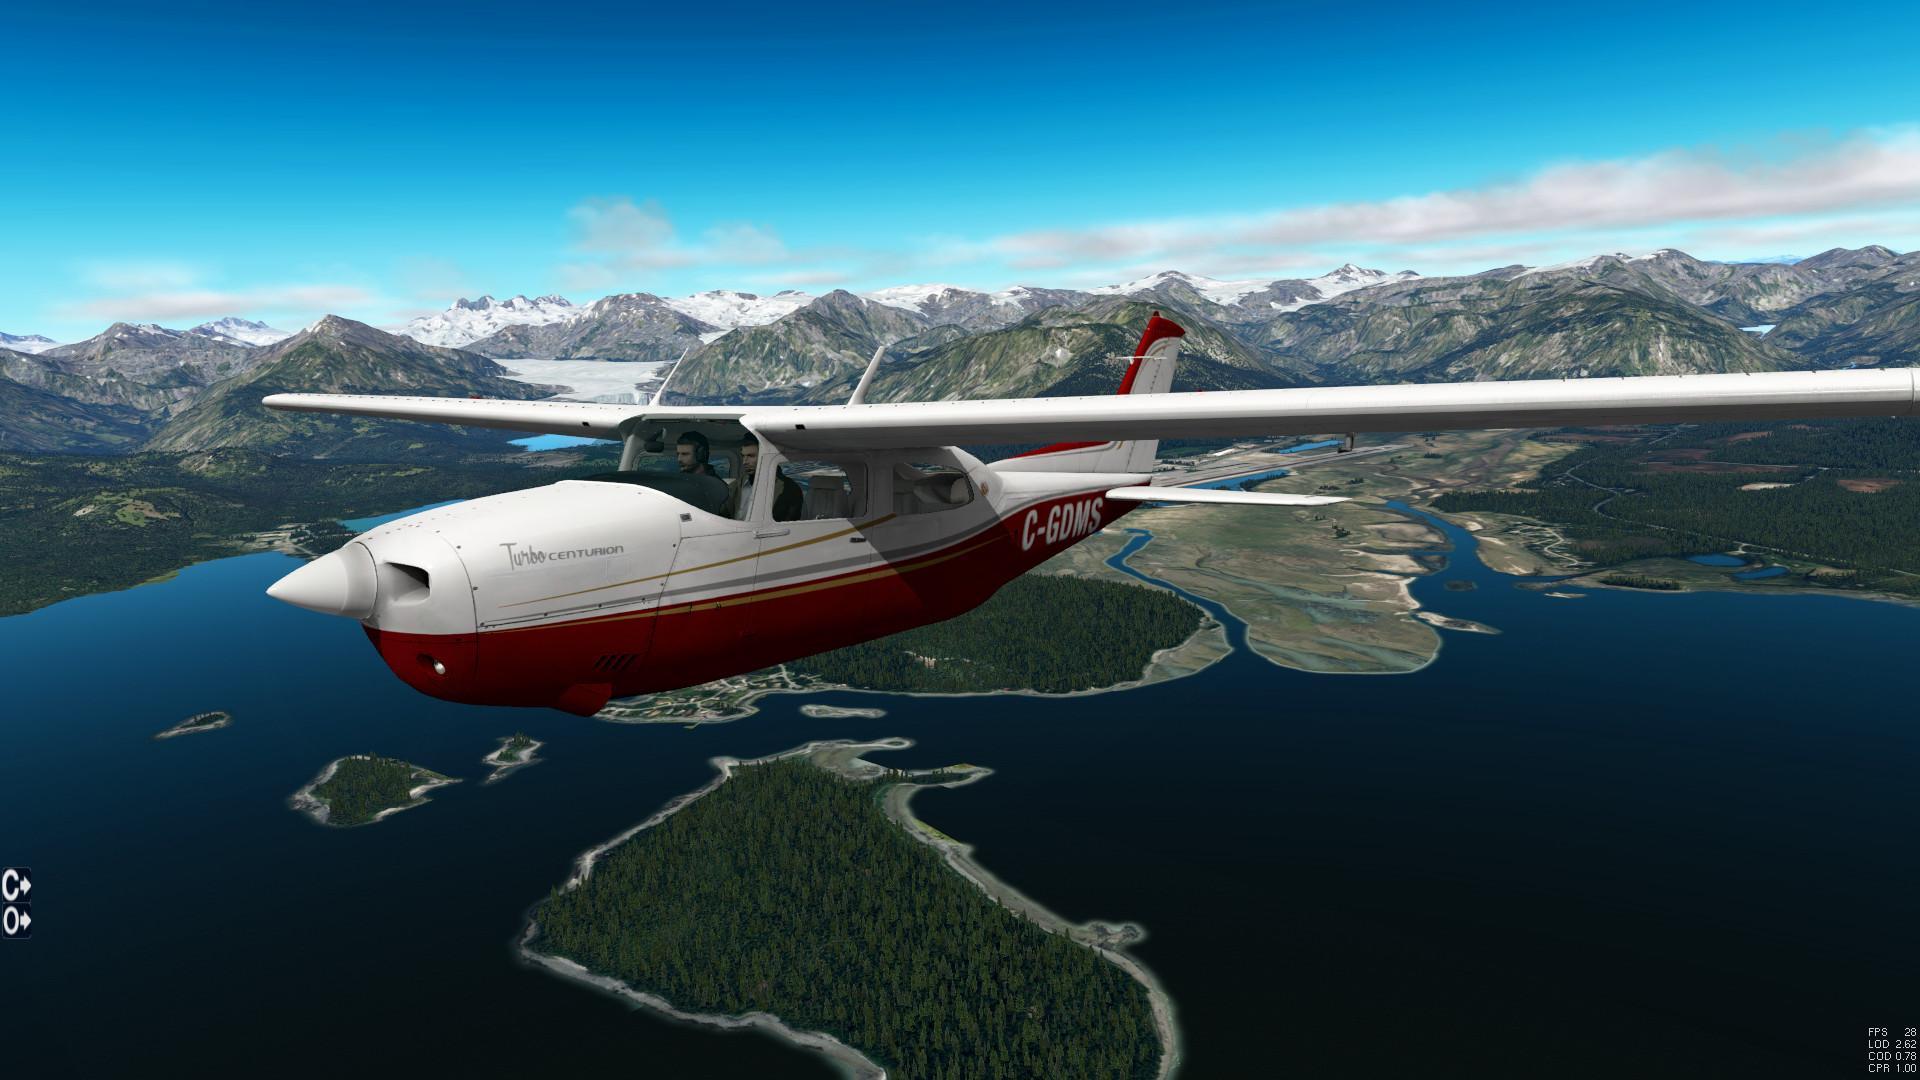 Cessna Centurion C-GDMS